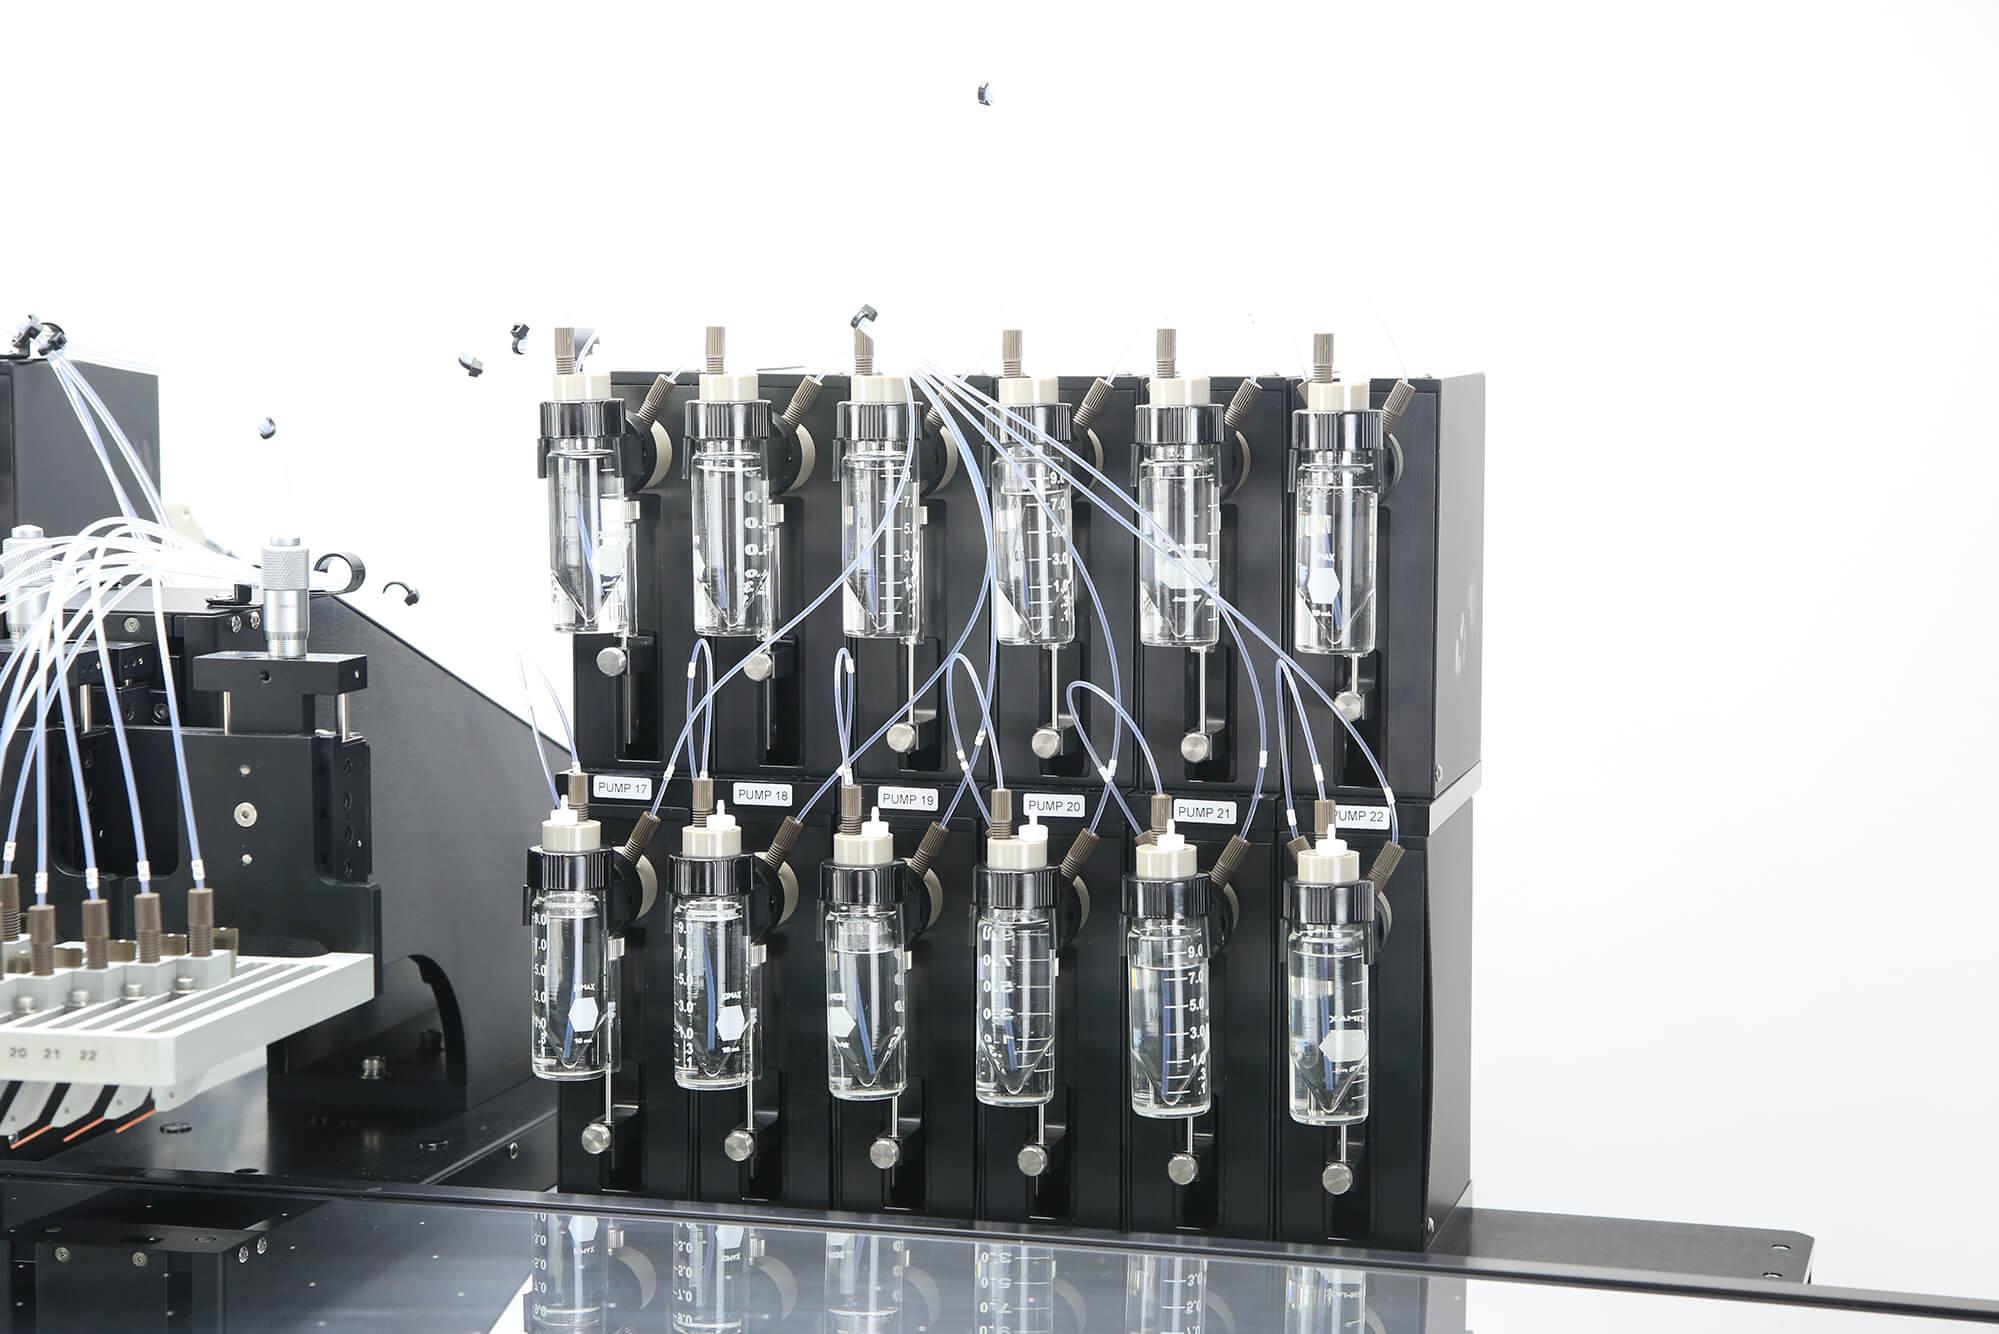 XYZ3210 Immunoblot Dispensing Pumps